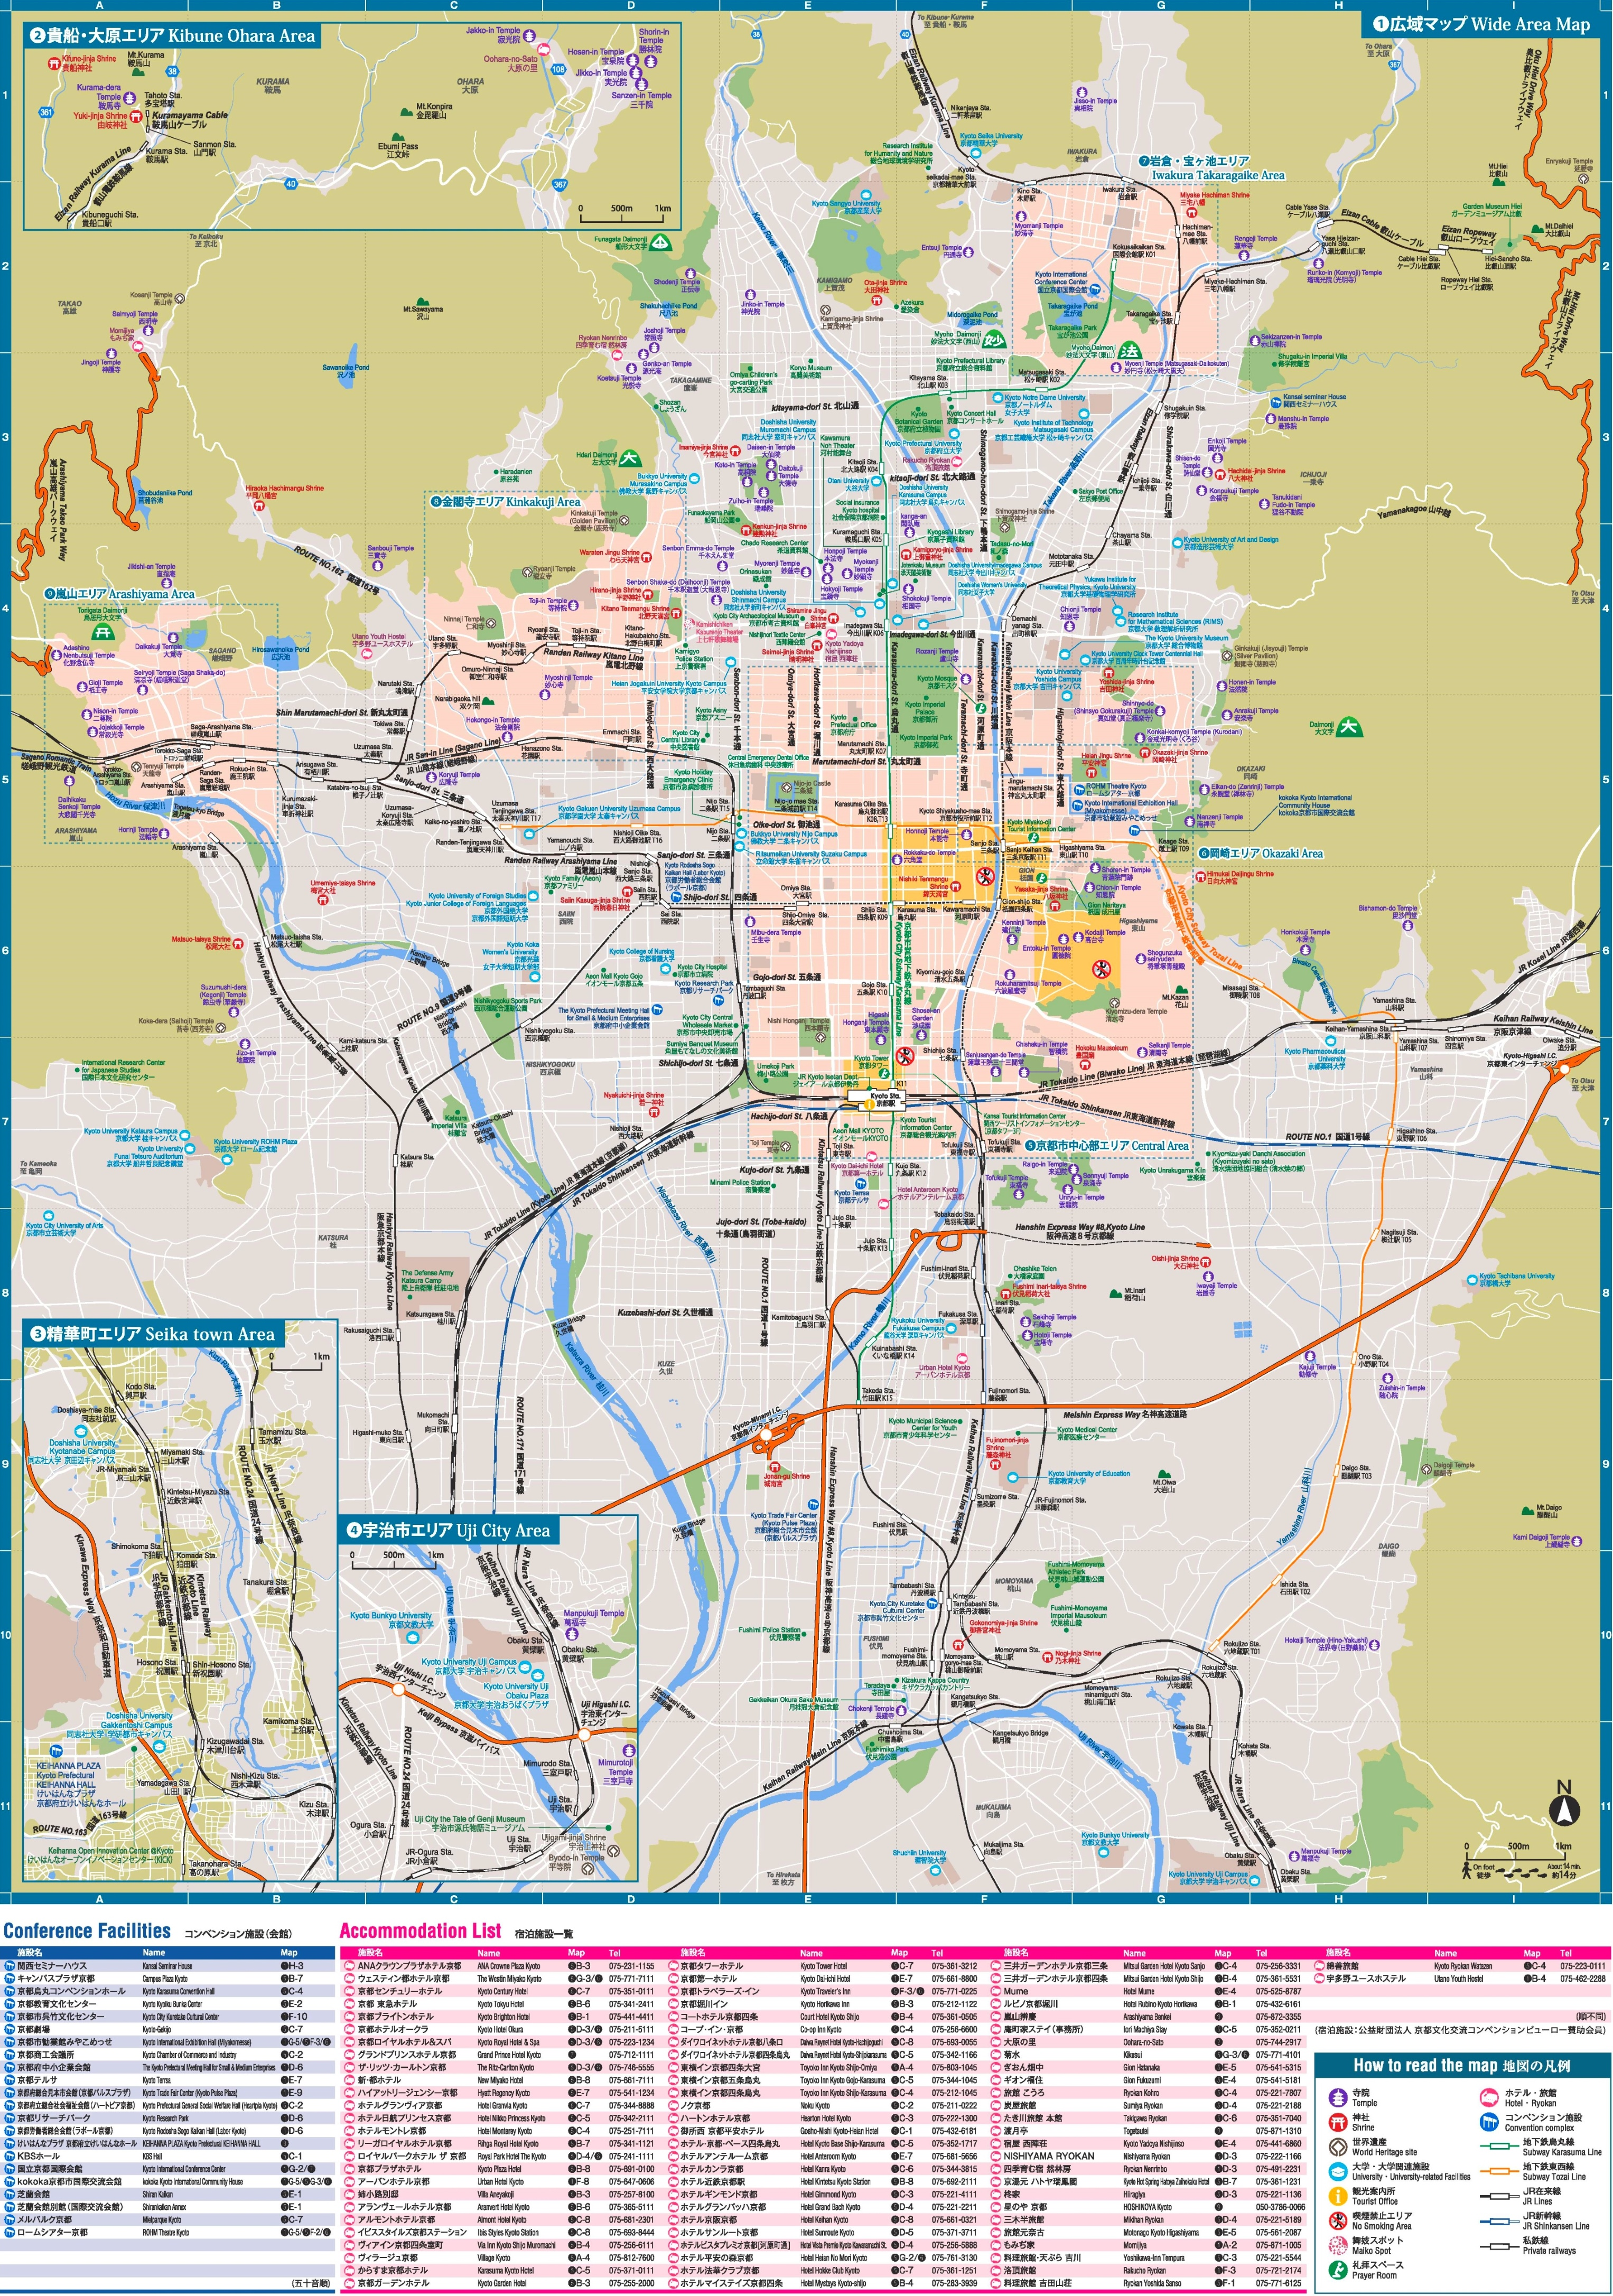 Kyoto sightseeing map on koyasan japan map, osaka japan map, edo japan map, kamakura japan map, toba japan map, capital of japan, hiroshima map, himeji castle, atsugi japan map, sea of japan map, sapporo japan map, yakushima japan map, nagasaki japan map, mount fuji, nara japan map, yamato japan map, osaka castle, kobe japan map, okinawa japan map, bali indonesia map, maizuru japan map, yokohama japan map, agra map, mt. fuji japan map,